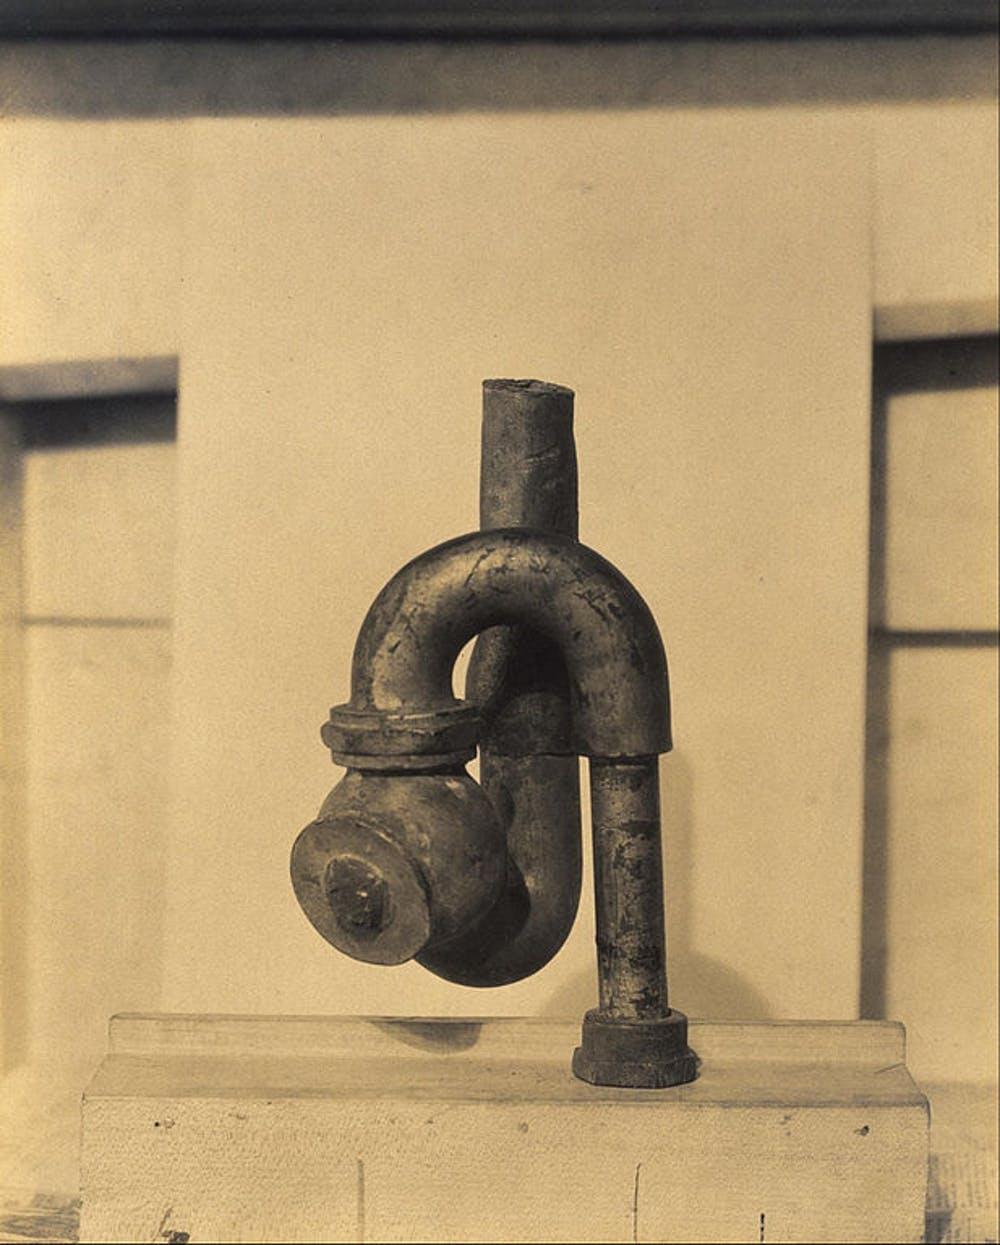 'God', escultura de Elsa von Freytag Loringhoven fotografiada por Morton Schamberg (1917) The Museum of Fine Arts, Houston